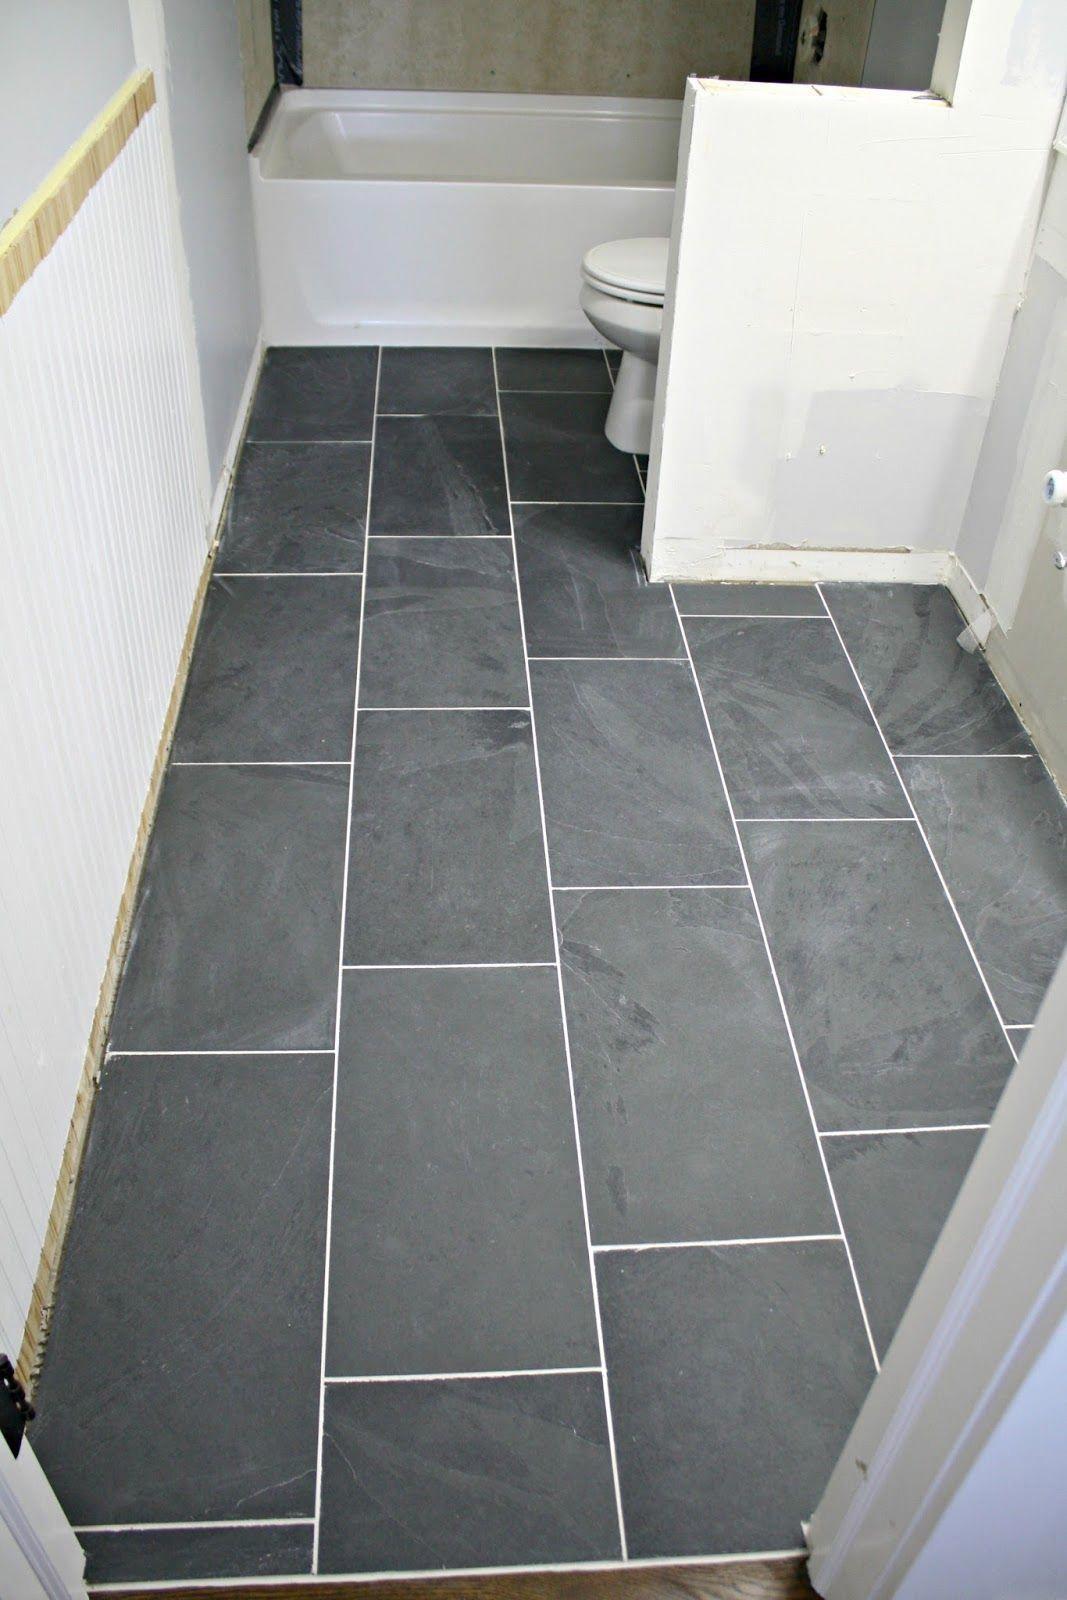 How To Tile Bathroom Floor Home Diy Slate Black And White Tile Bathroom Floor With Dark Grout Slate Bathroom Tile Slate Bathroom Floor Diy Bathroom Makeover